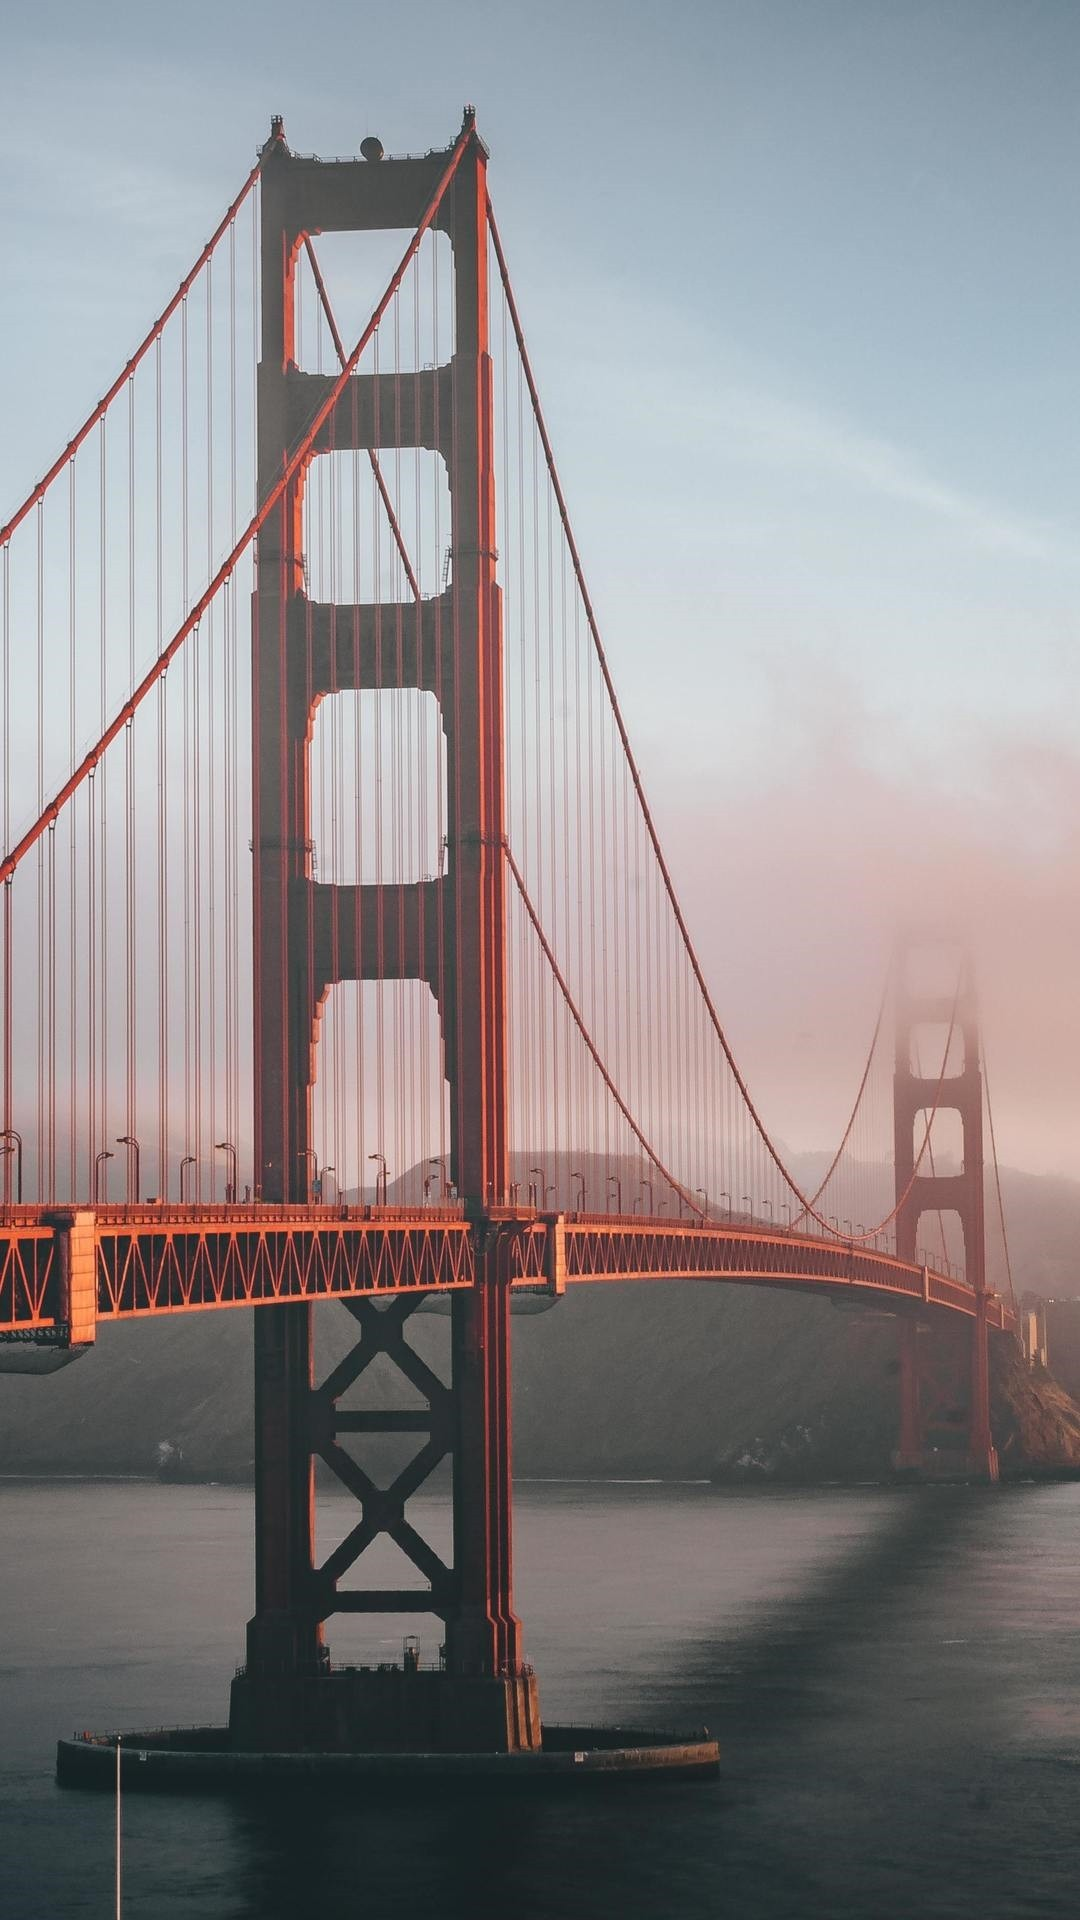 Golden Gate Bridge iphone 8 plus wallpaper